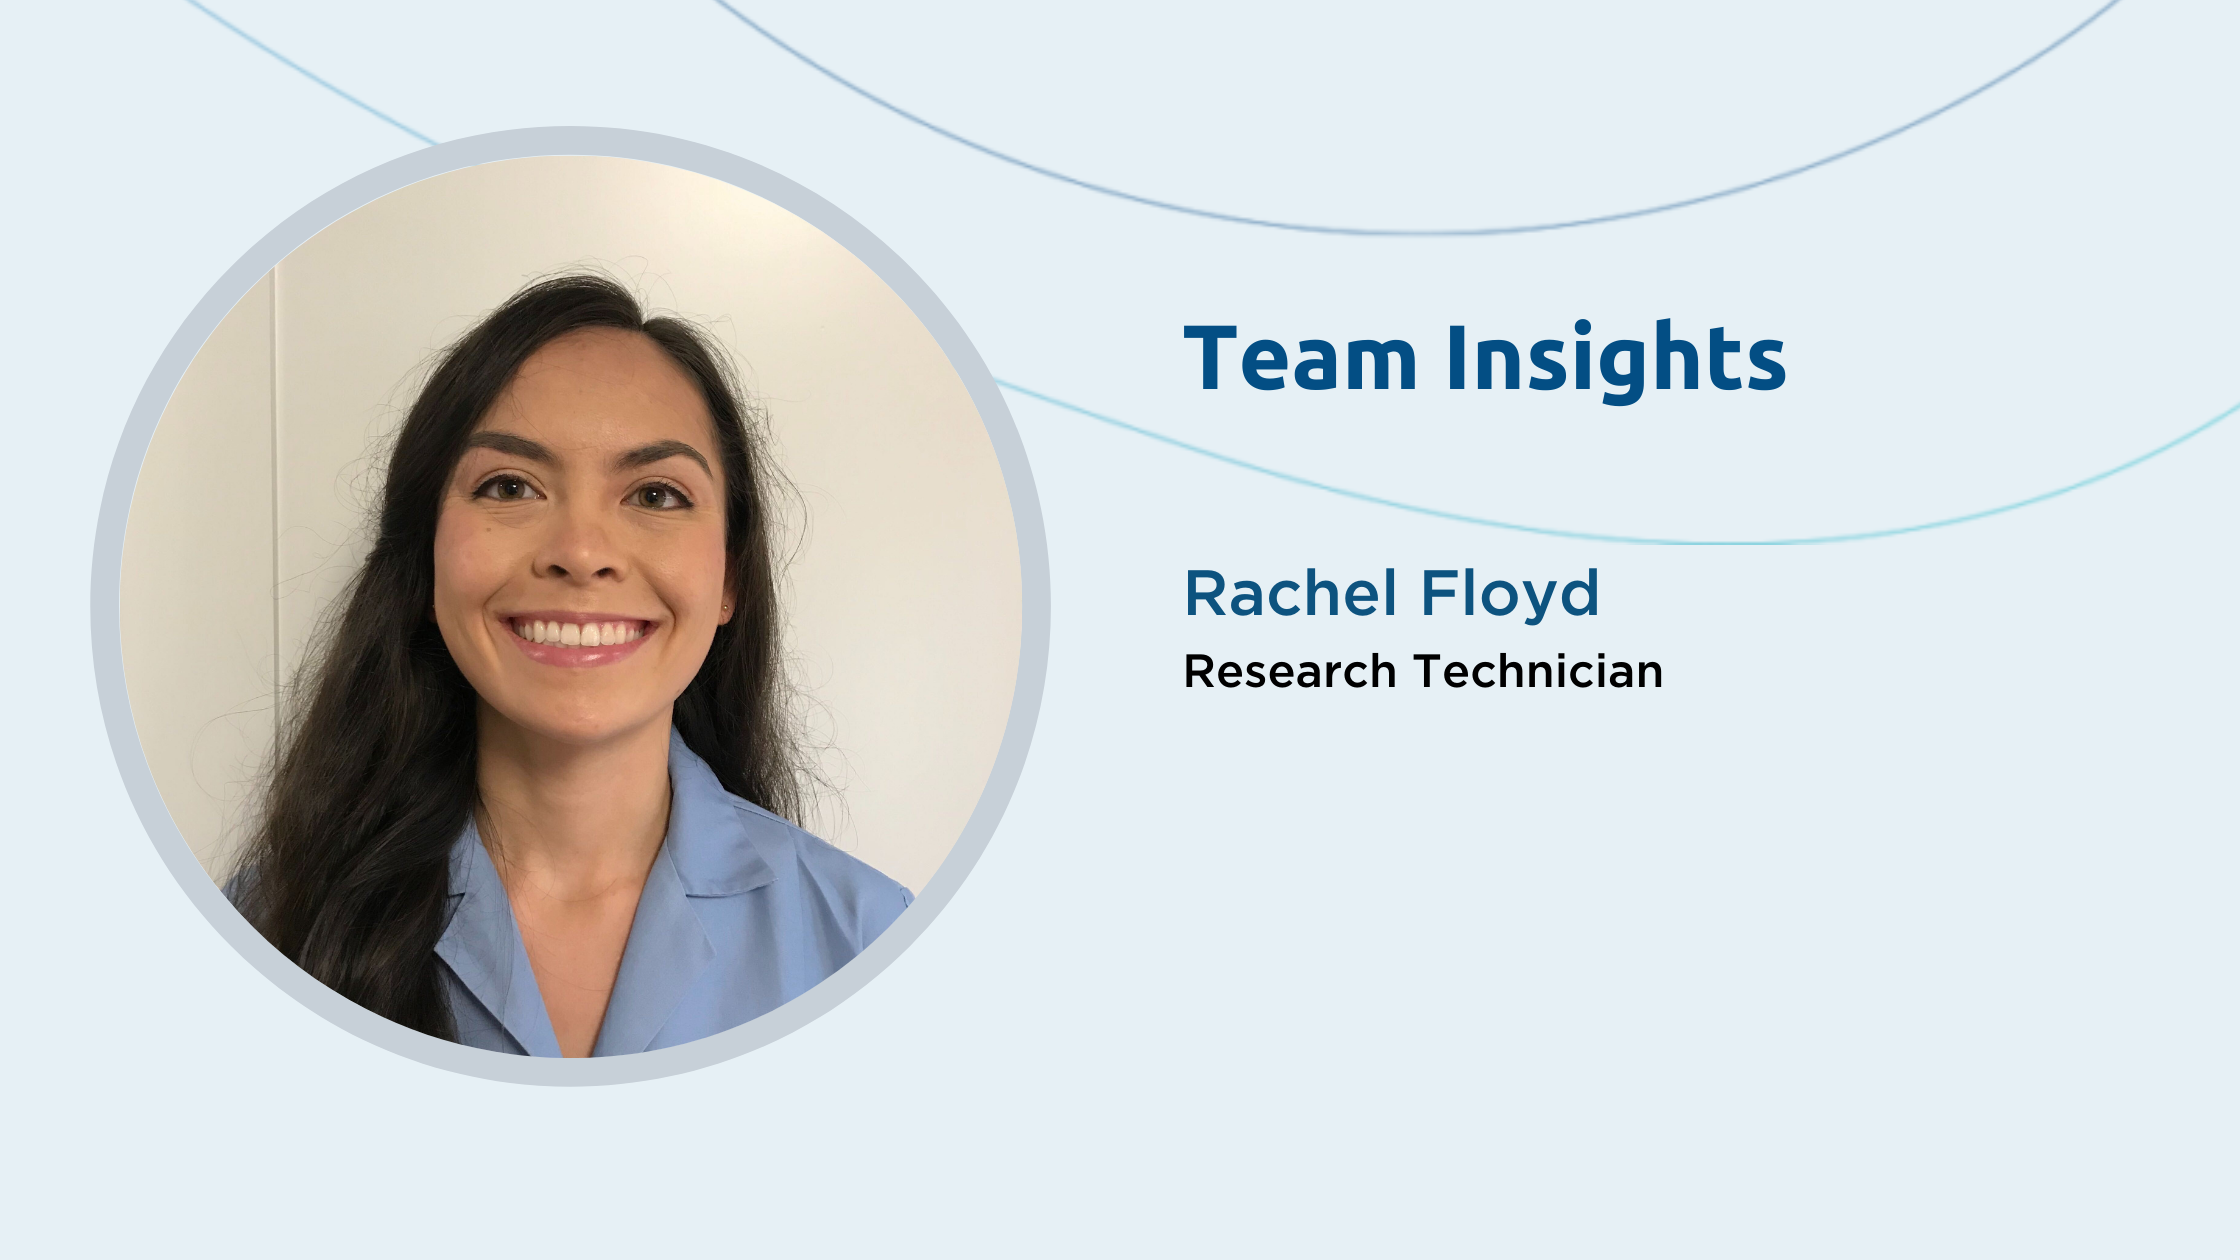 Team Insights: Rachel Floyd